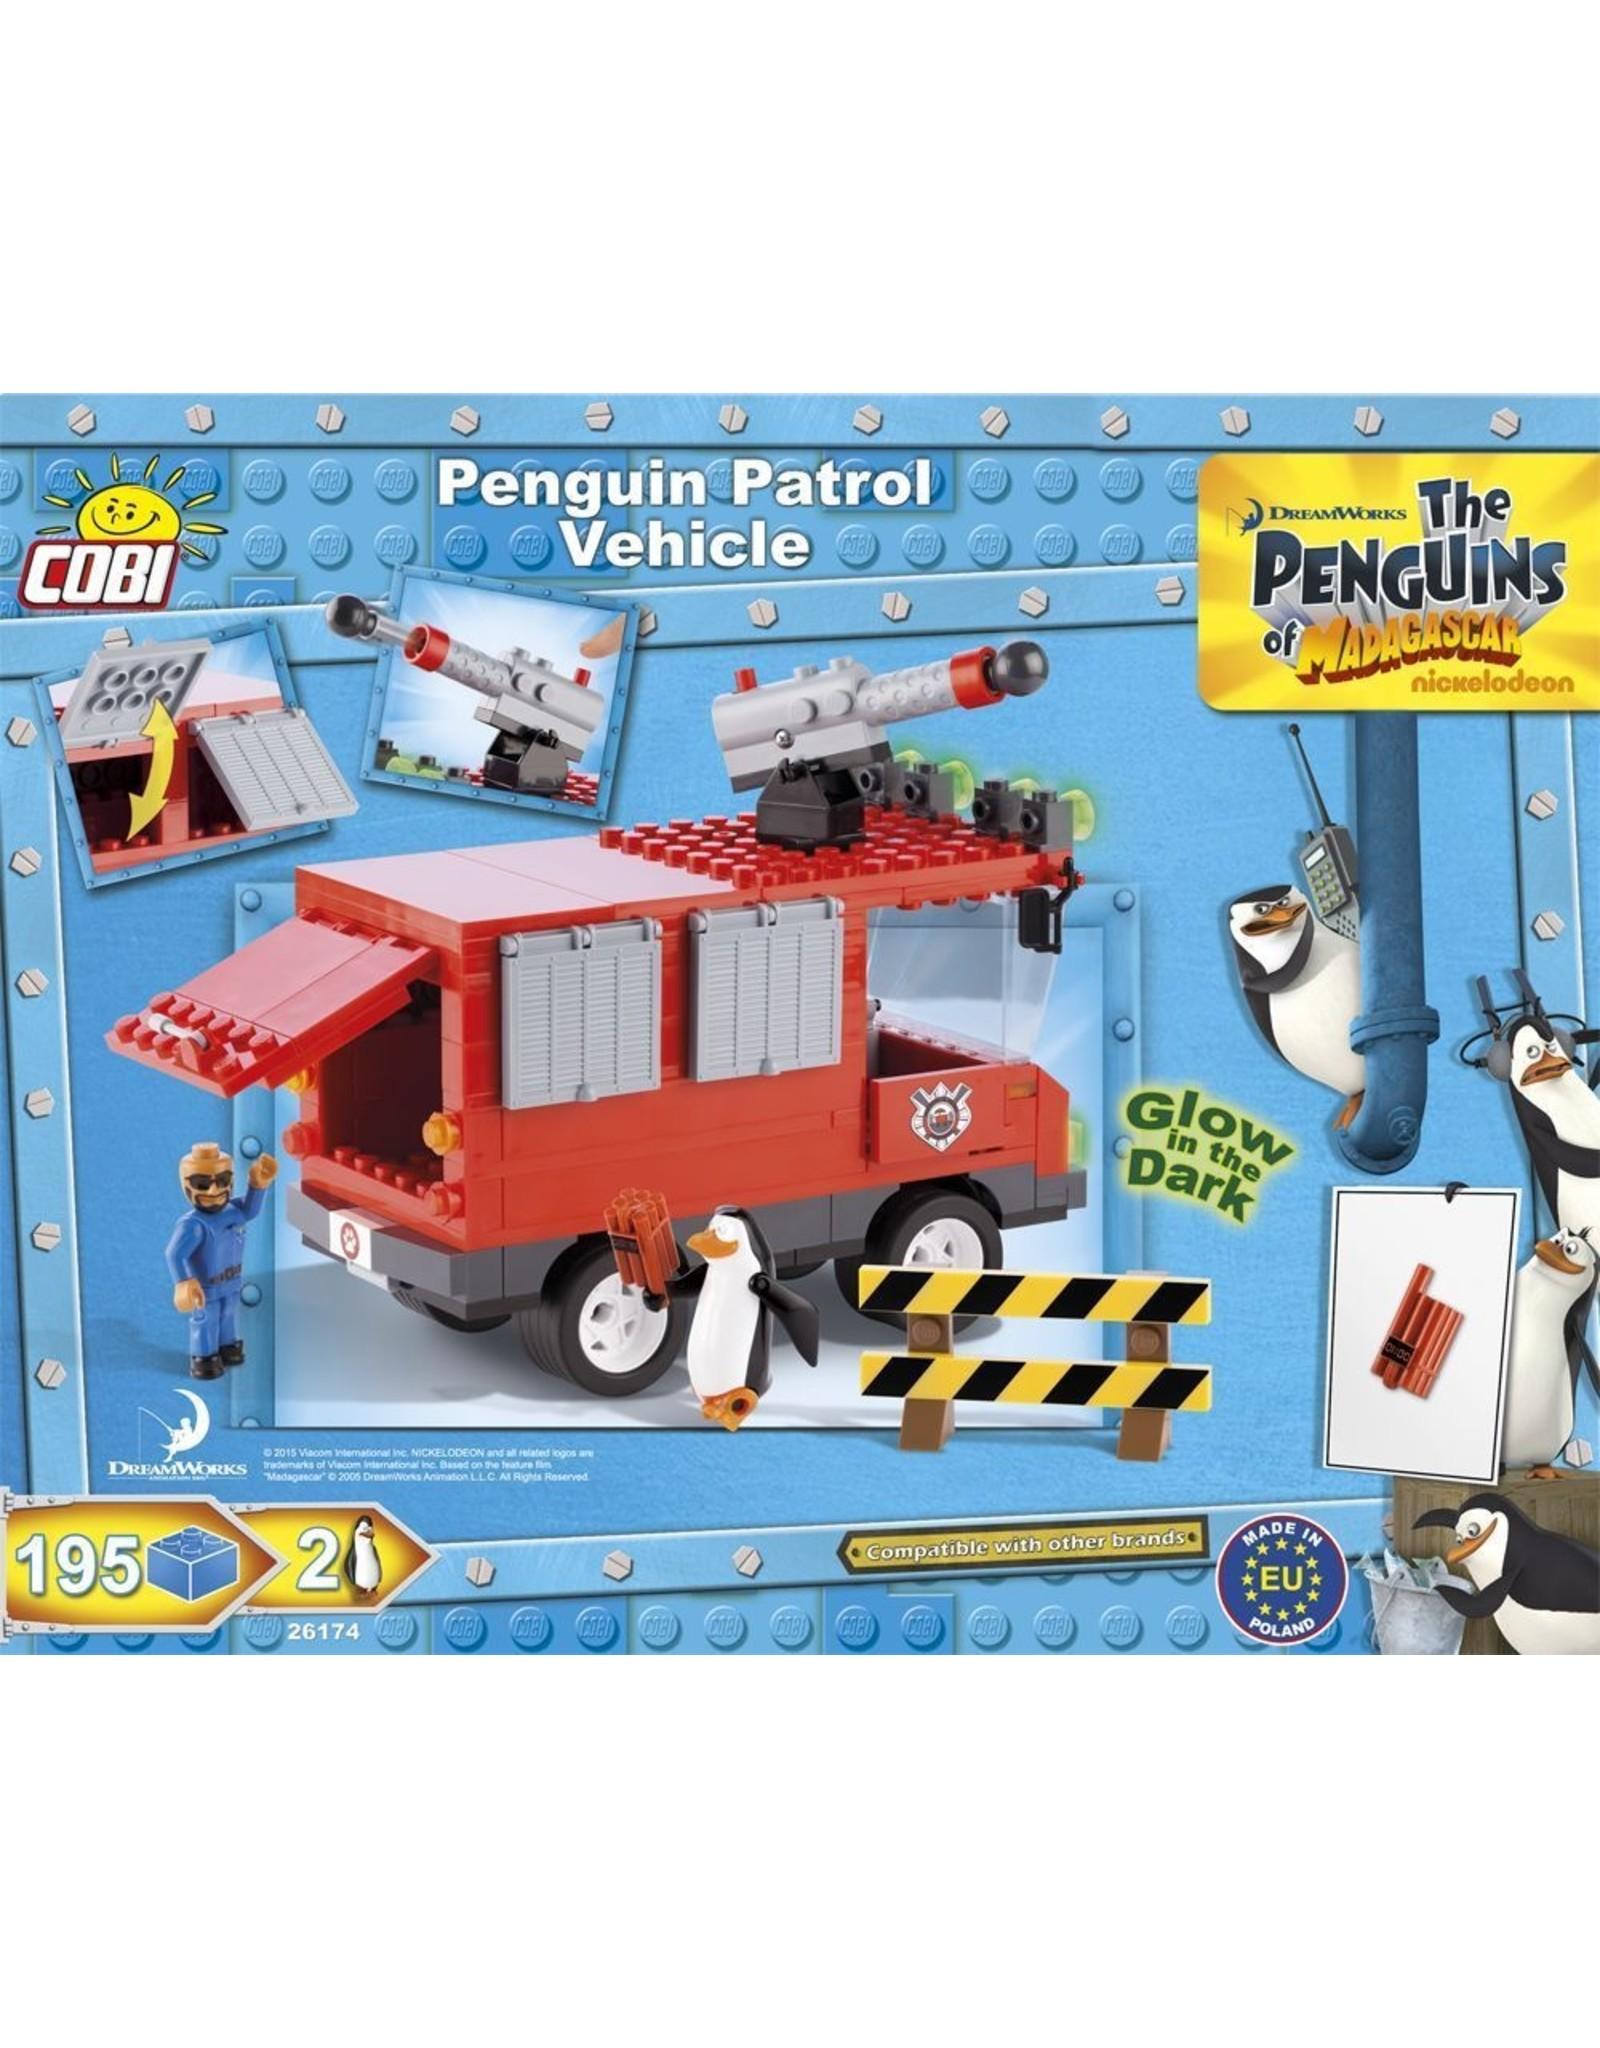 COBI COBI Penguins 26174 - Penguin Patrol Vehicle